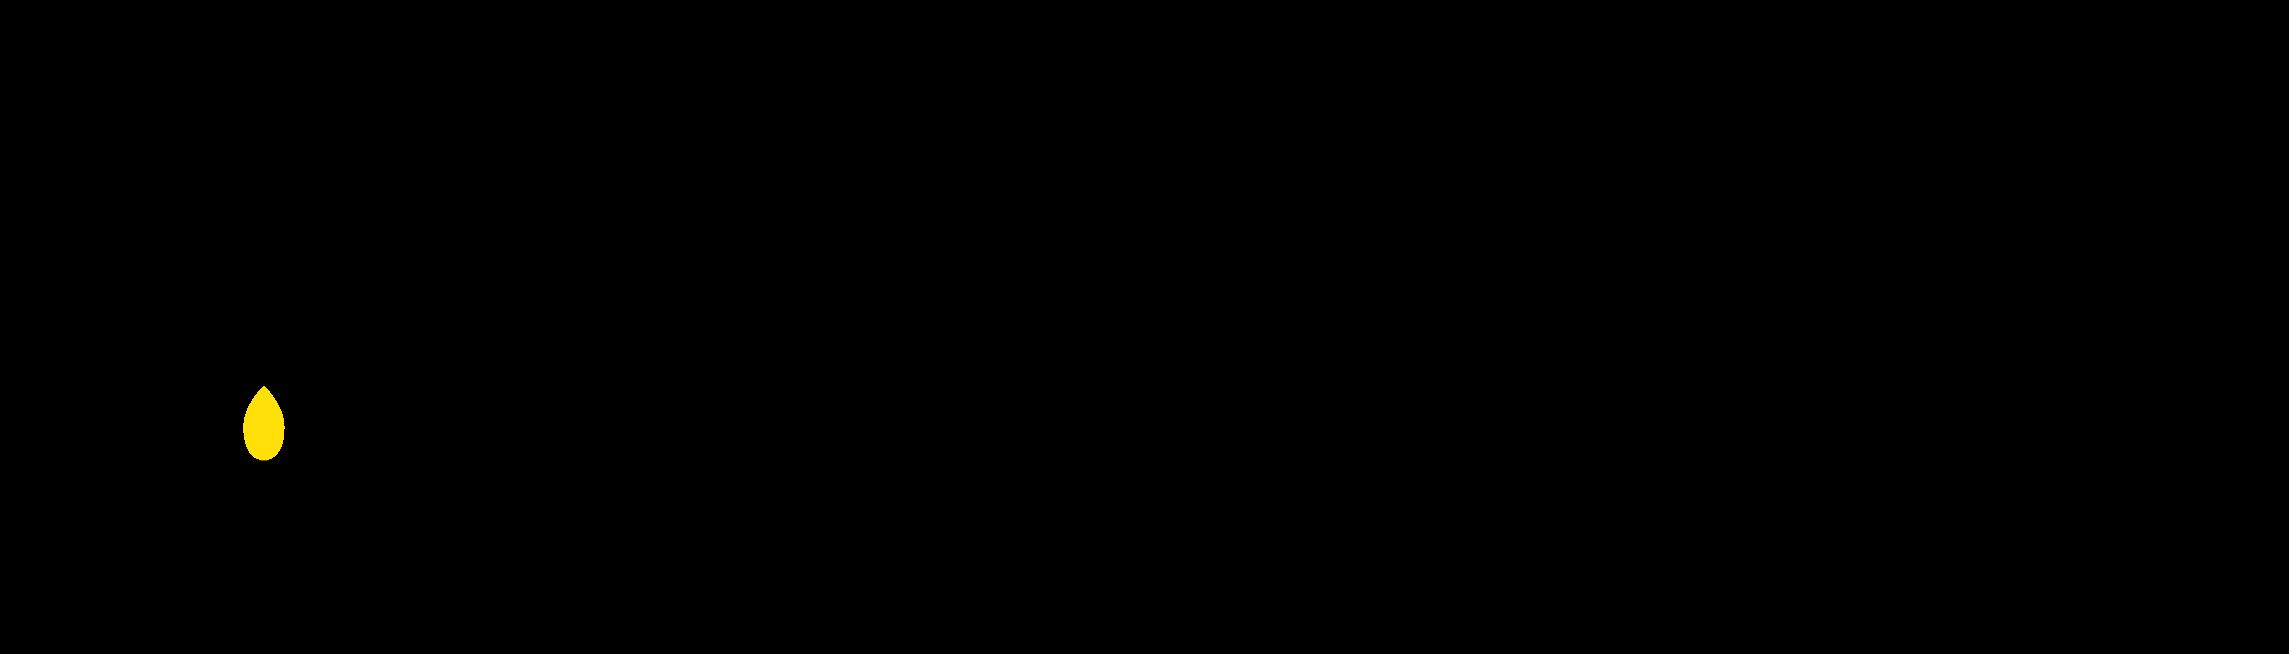 SUOULAMP